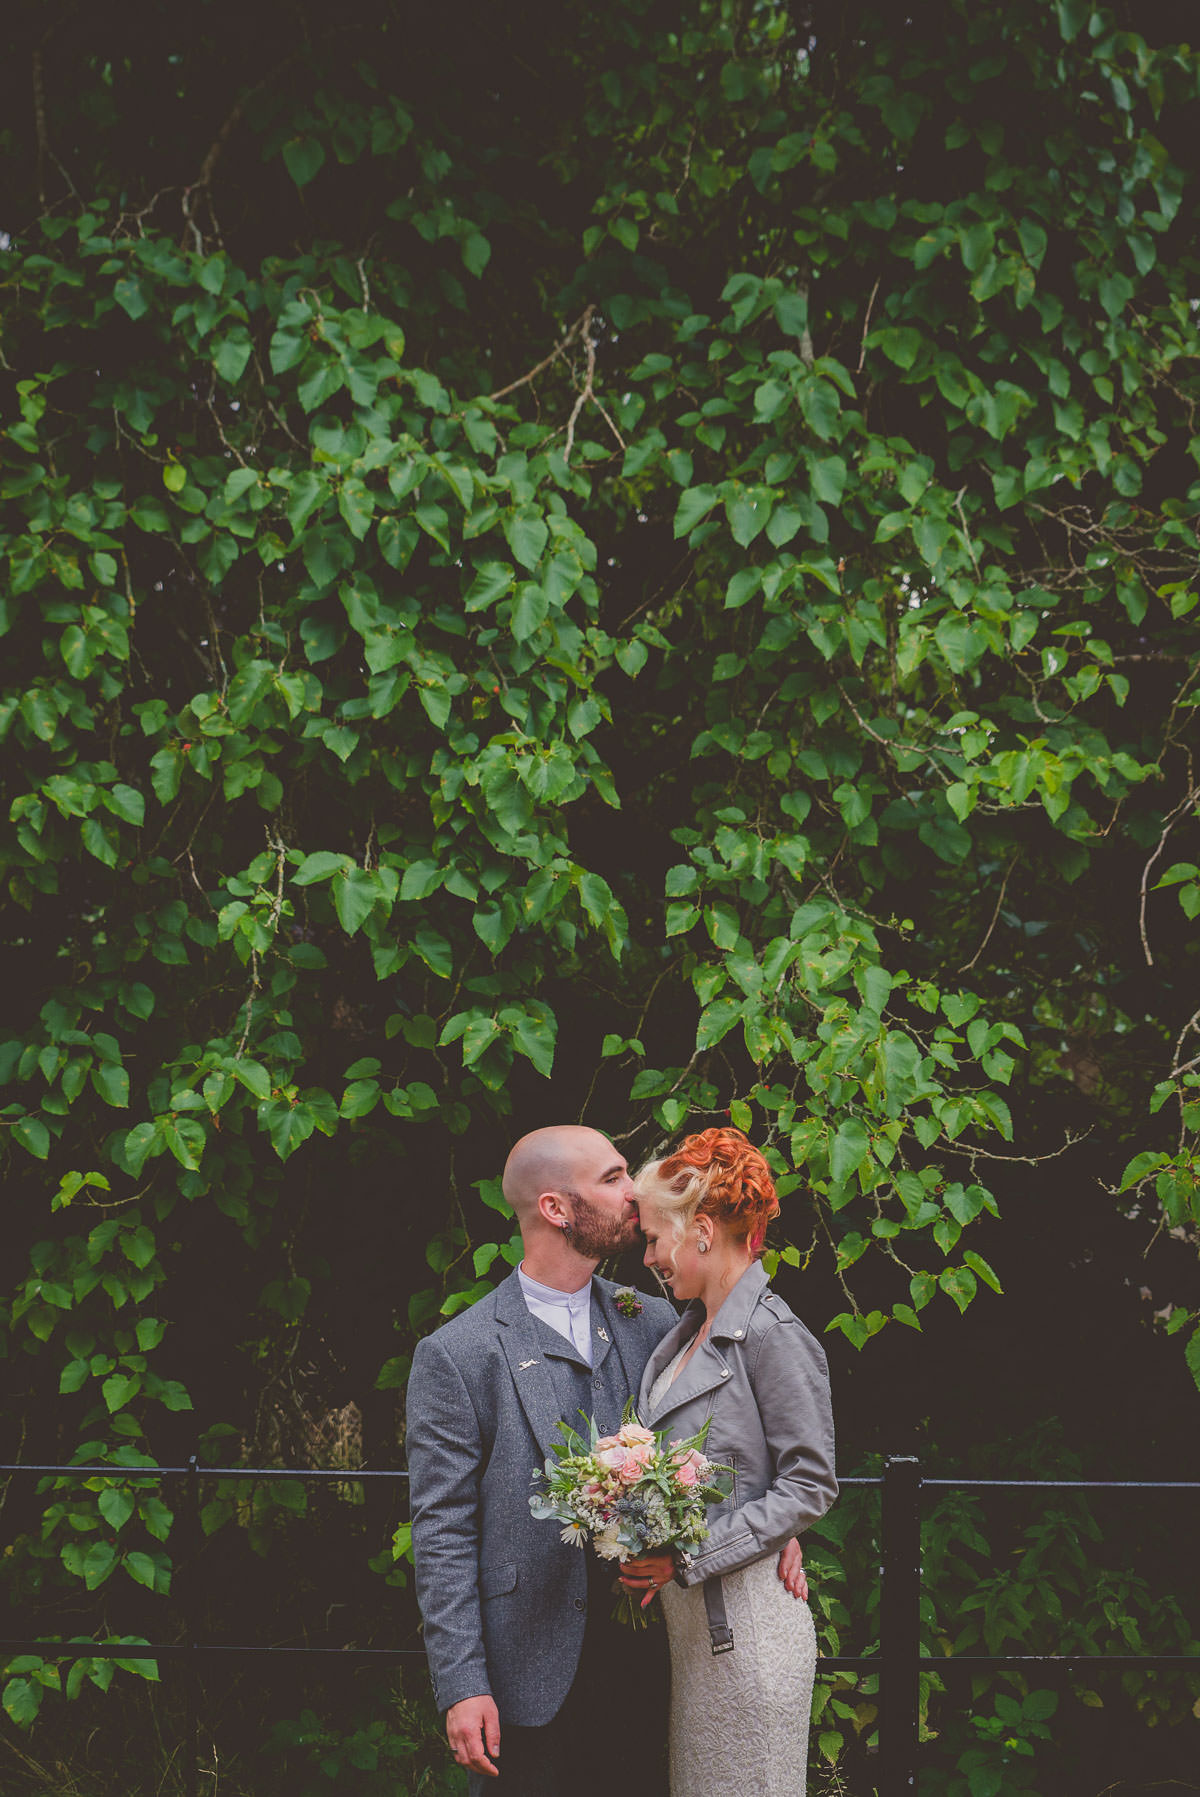 creative wedding portrait photography